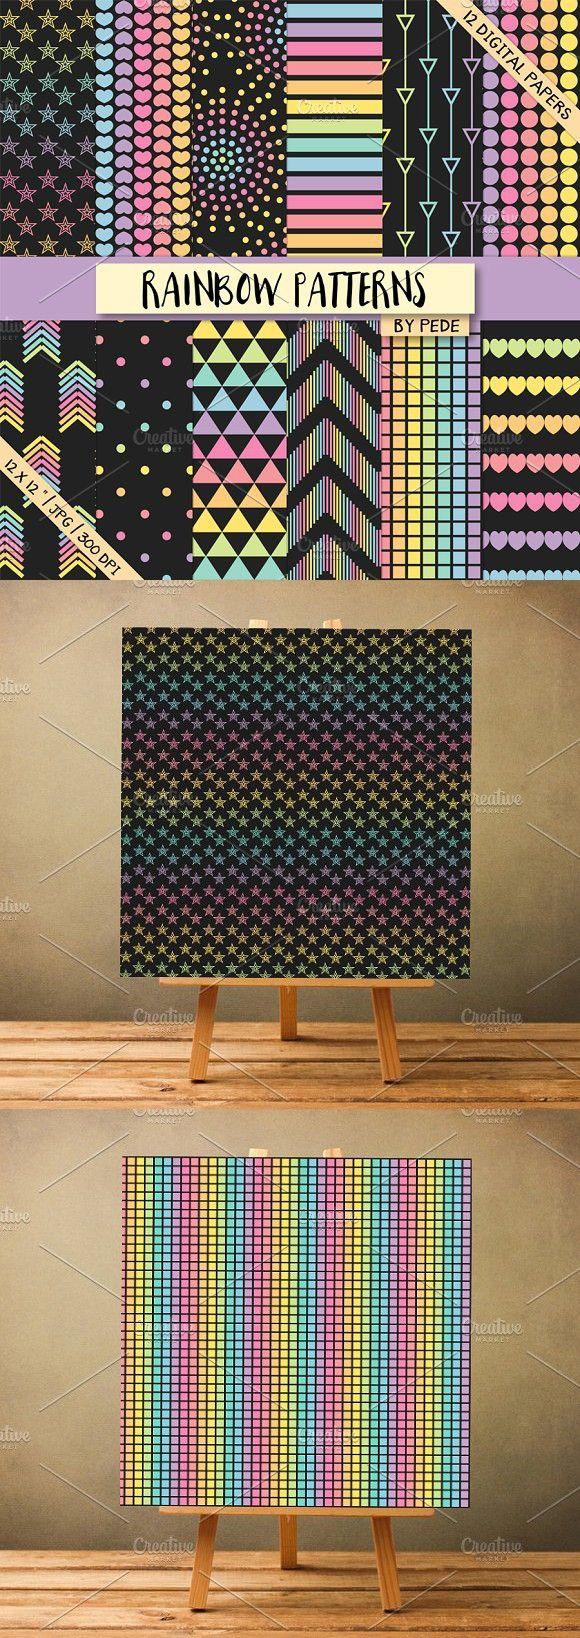 Rainbow patterns on black background. Patterns